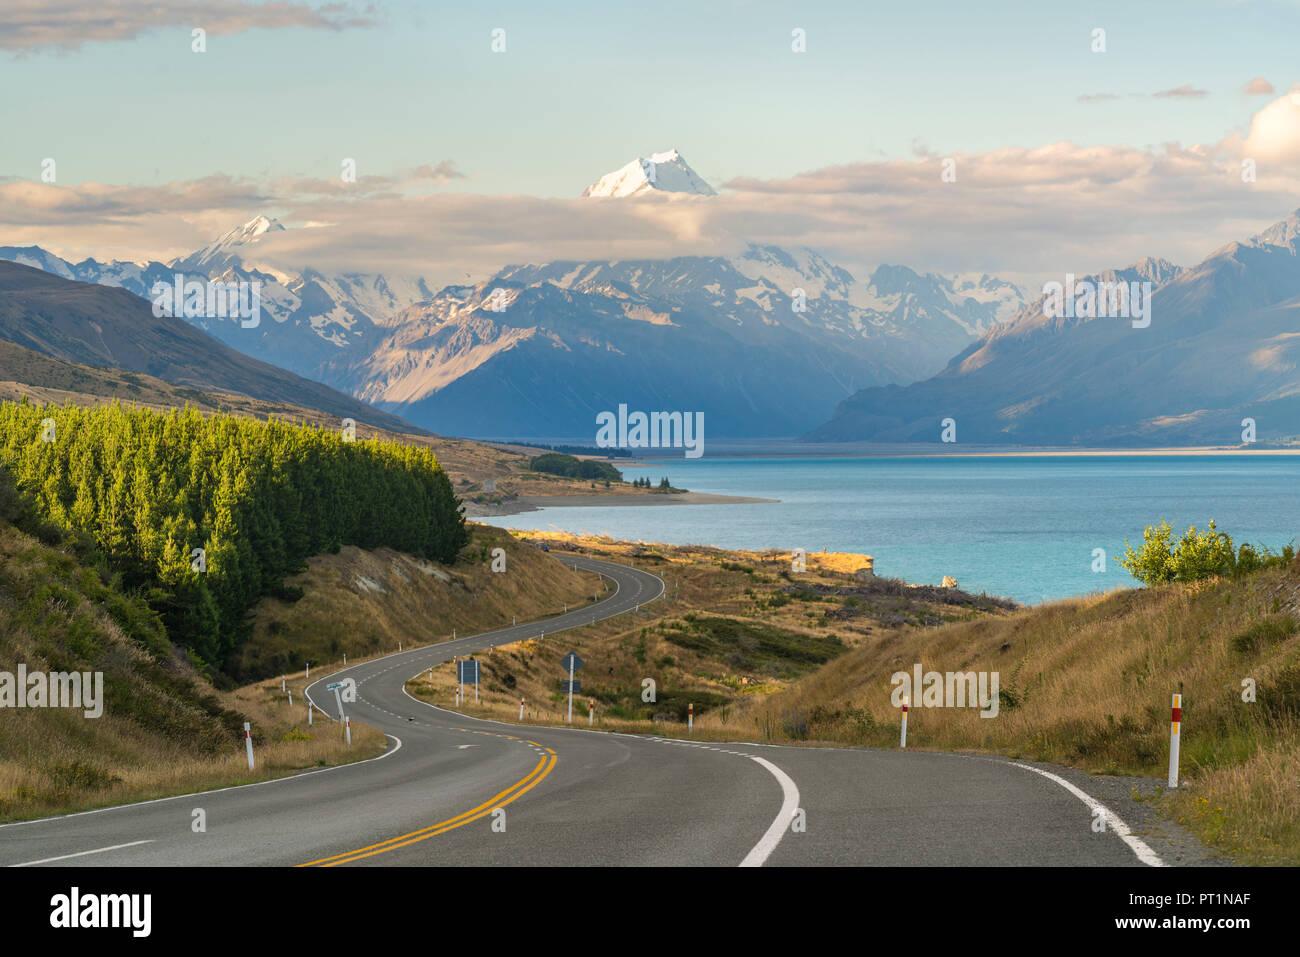 Straße neben Lake Pukaki mit Blick in Richtung Mt. Cook, Ben Ohau, Mackenzie Bezirk, Region Canterbury, Südinsel, Neuseeland, Stockfoto